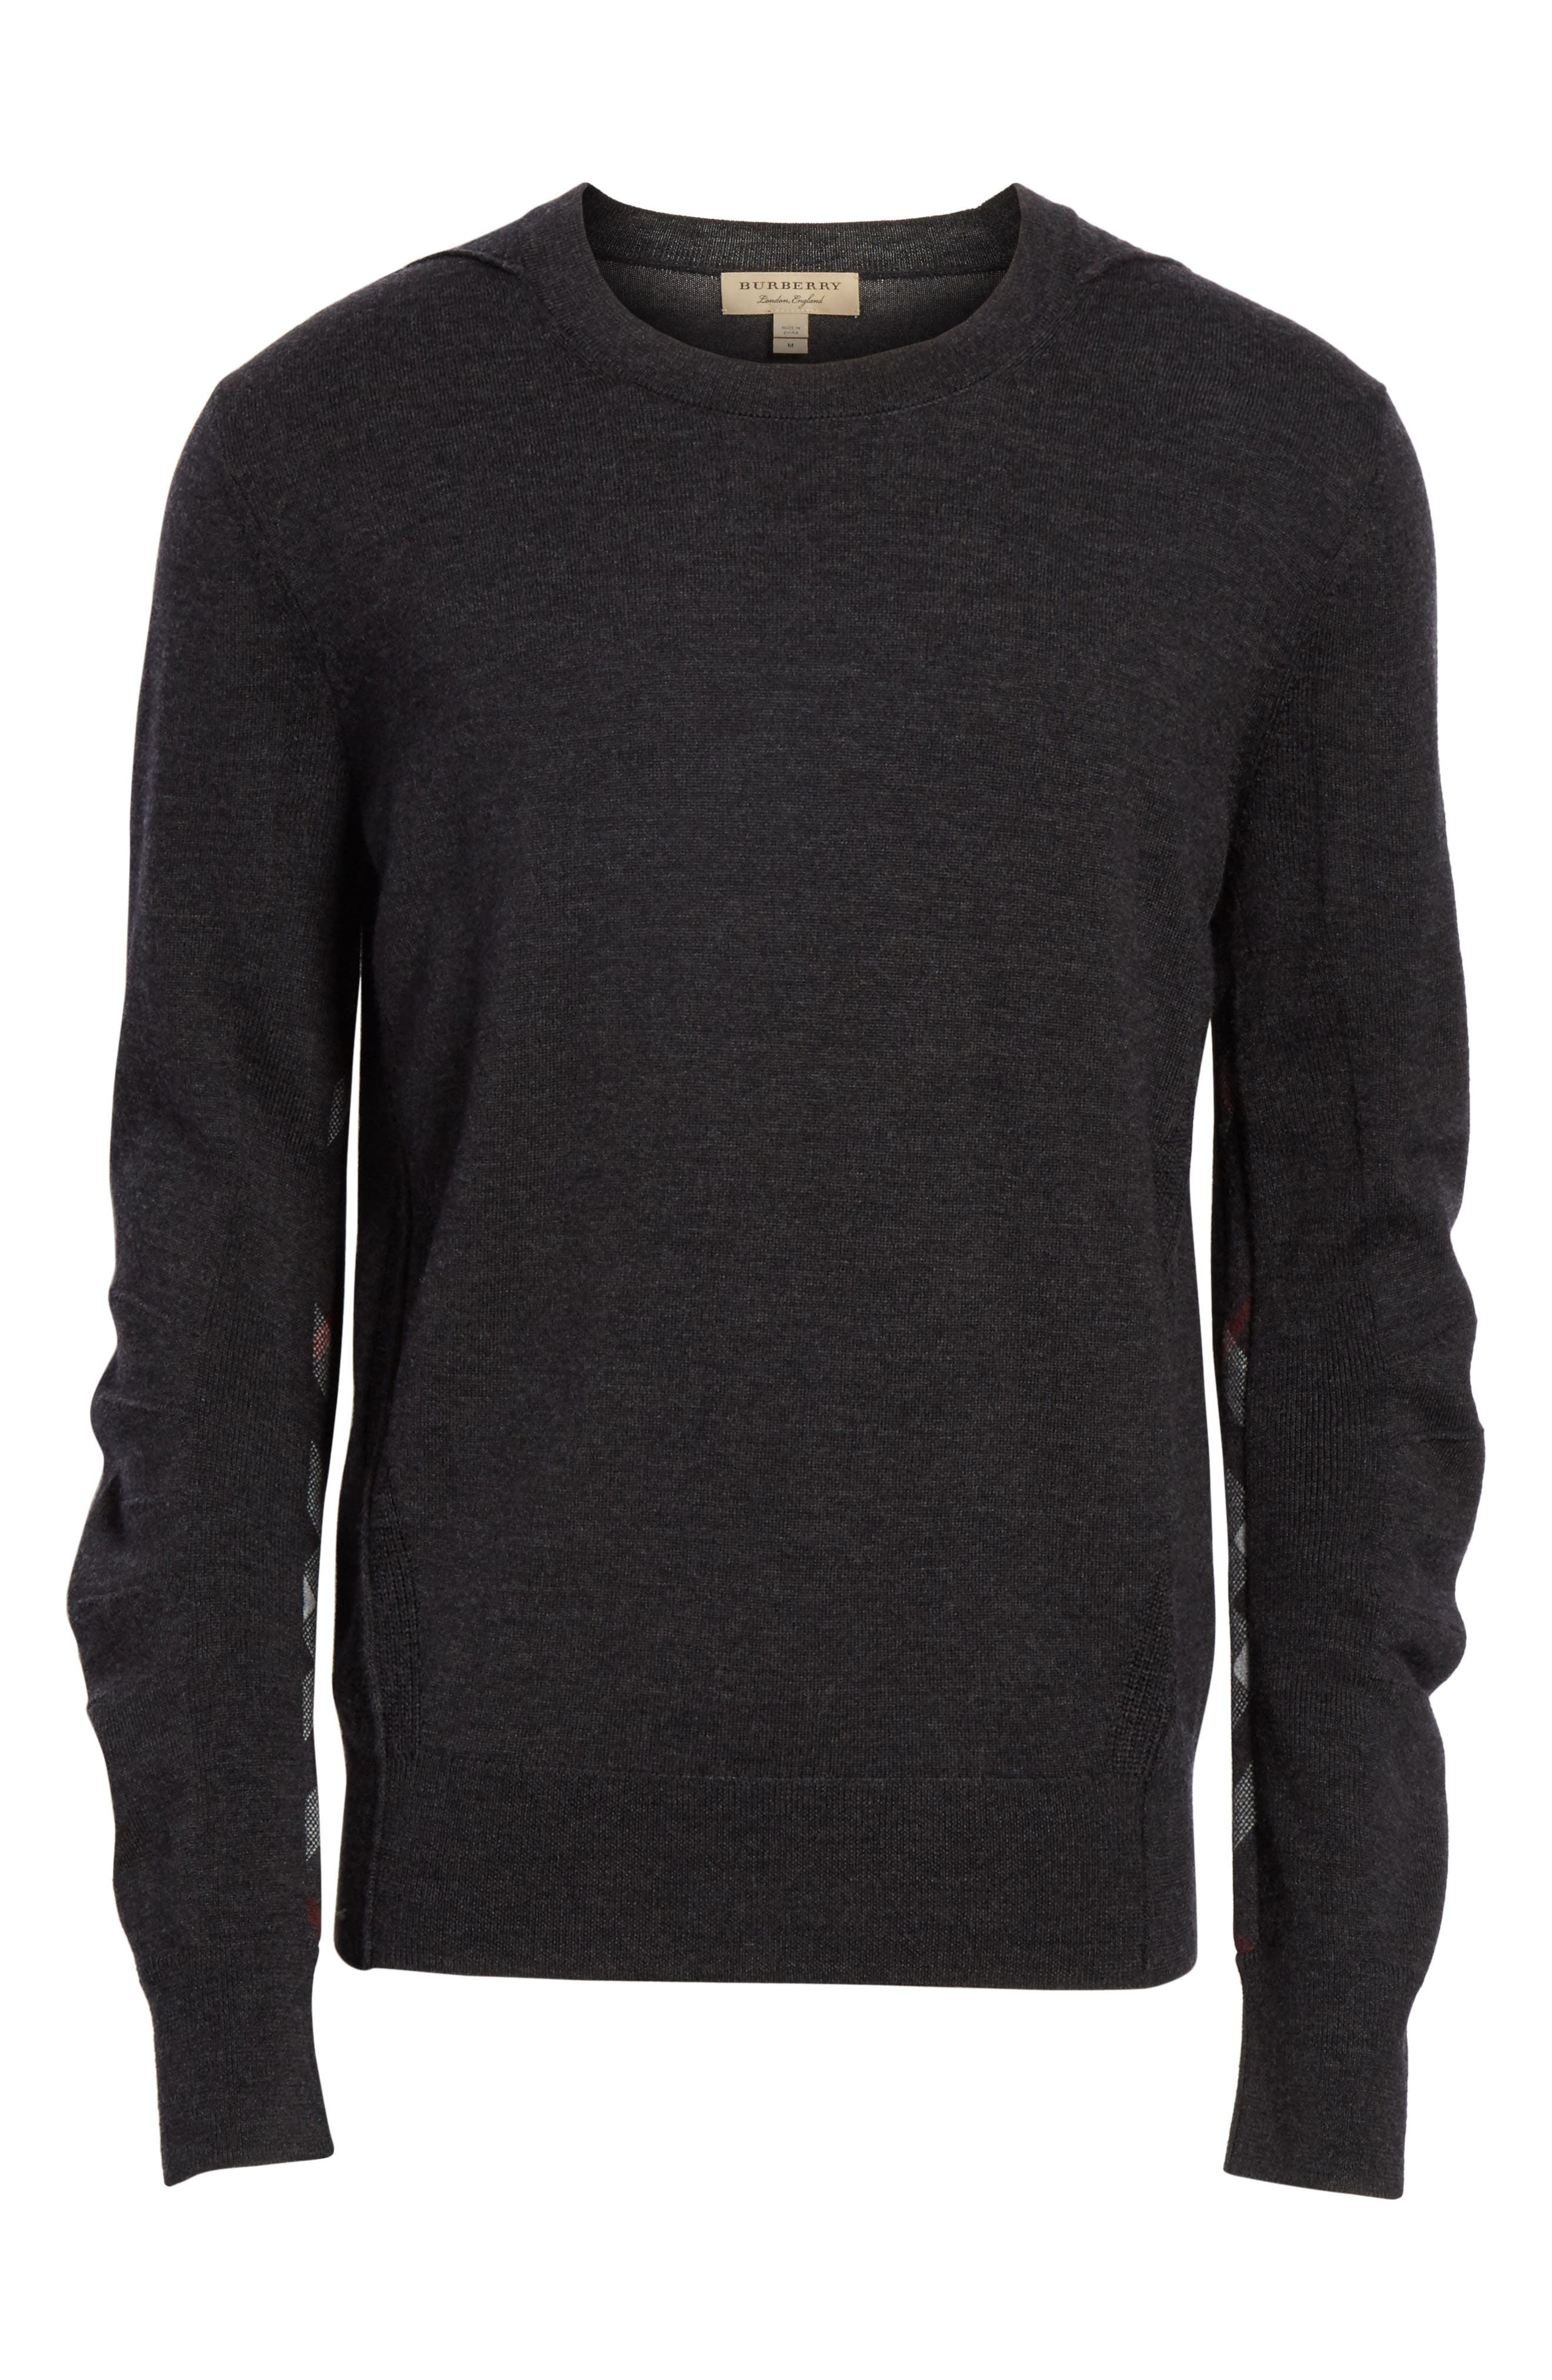 Carter Merino Wool Crewneck Sweater,                             Alternate thumbnail 17, color,